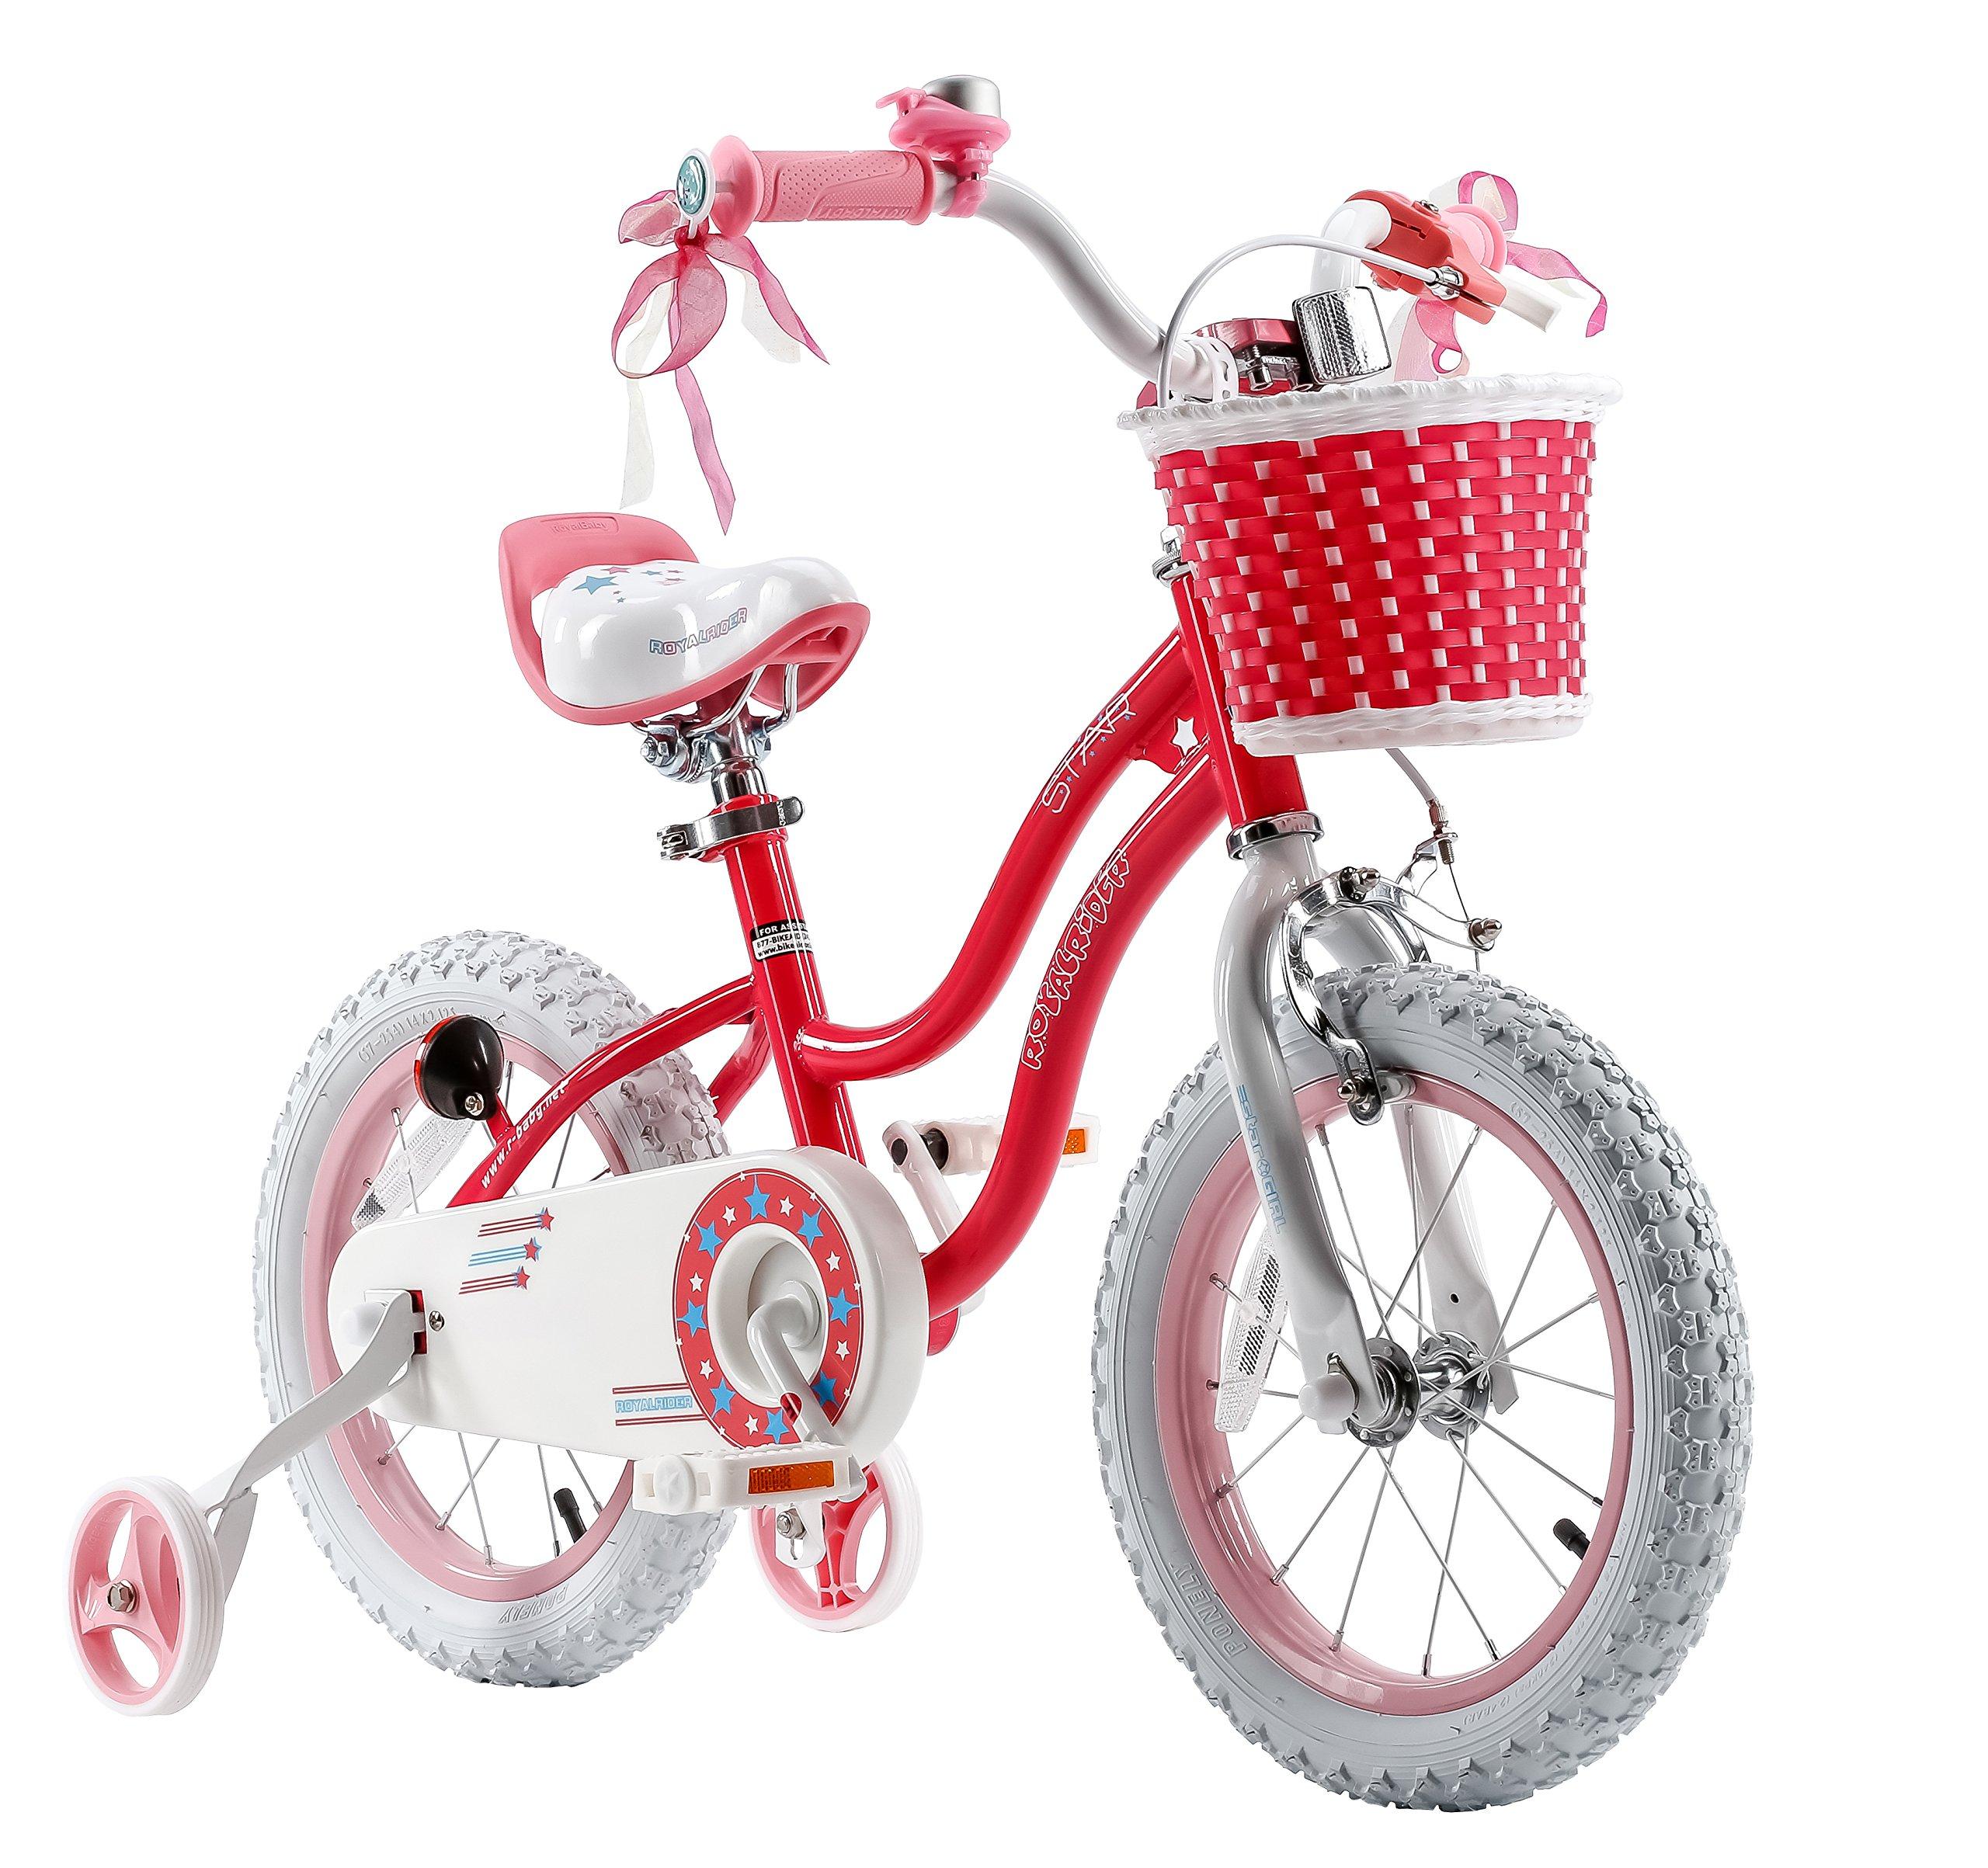 RoyablBaby Stargirl Girl's Bike with Training Wheels or Kickstand product image